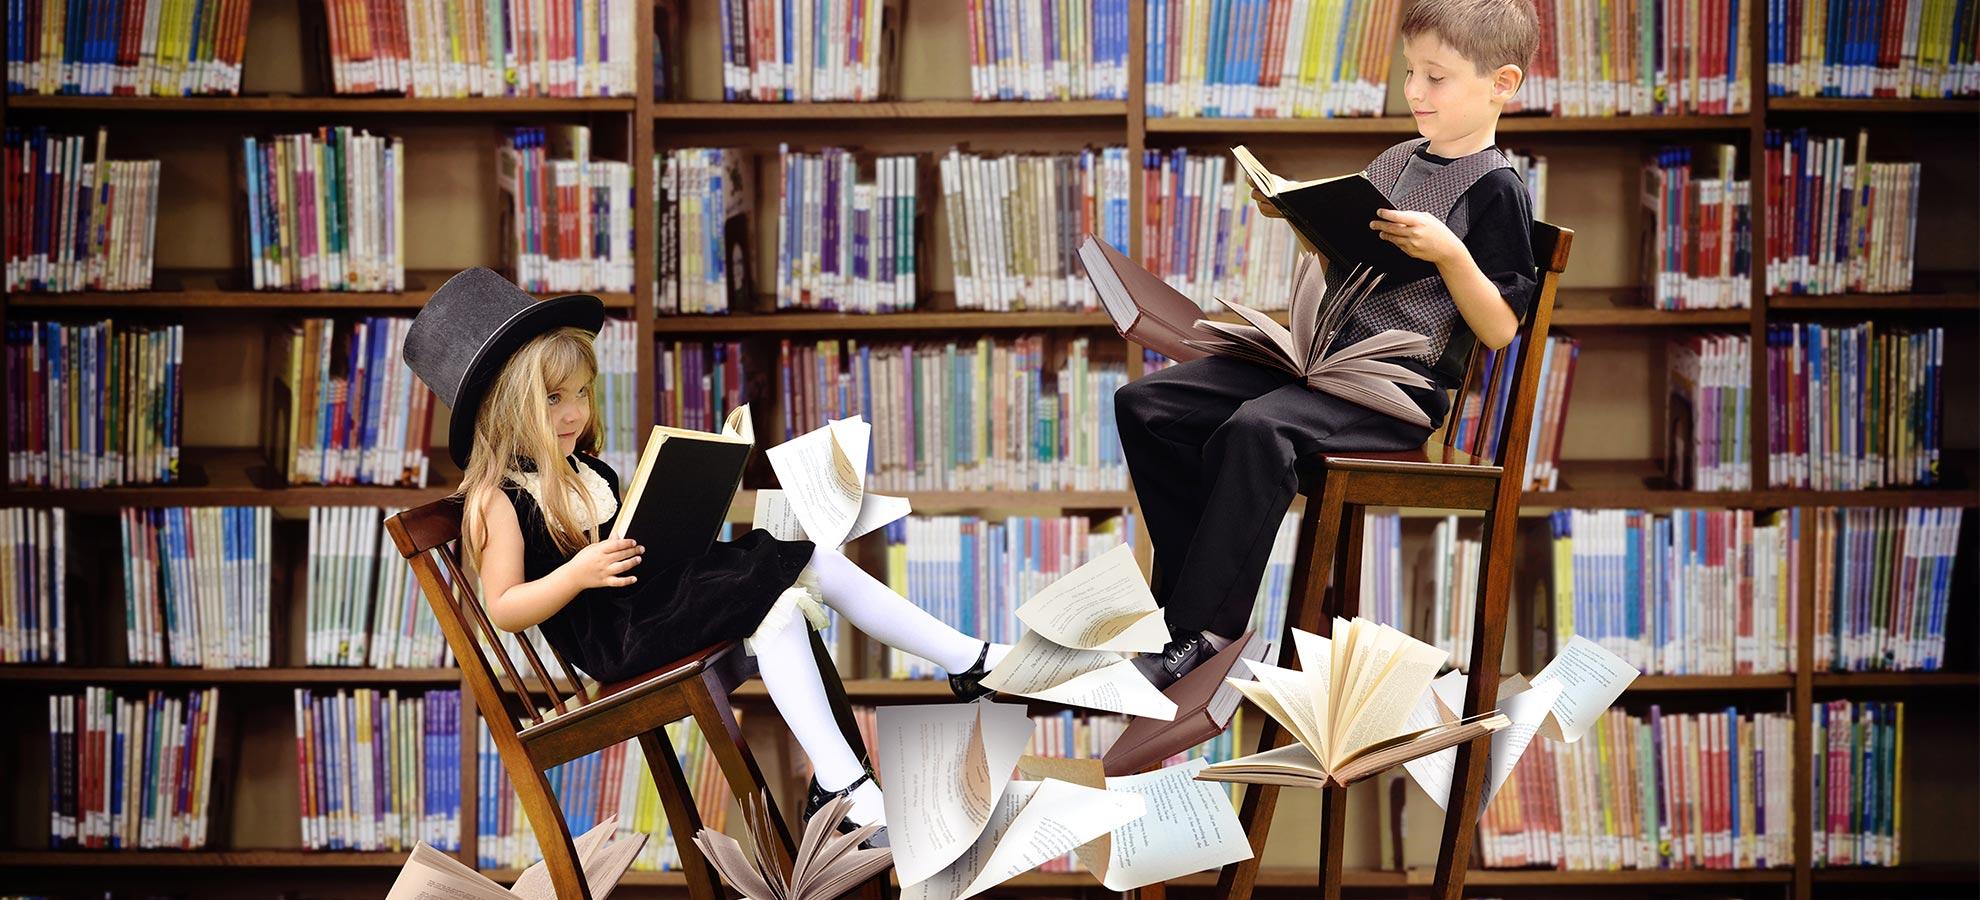 書籍出版・商業出版・企画出版のご相談